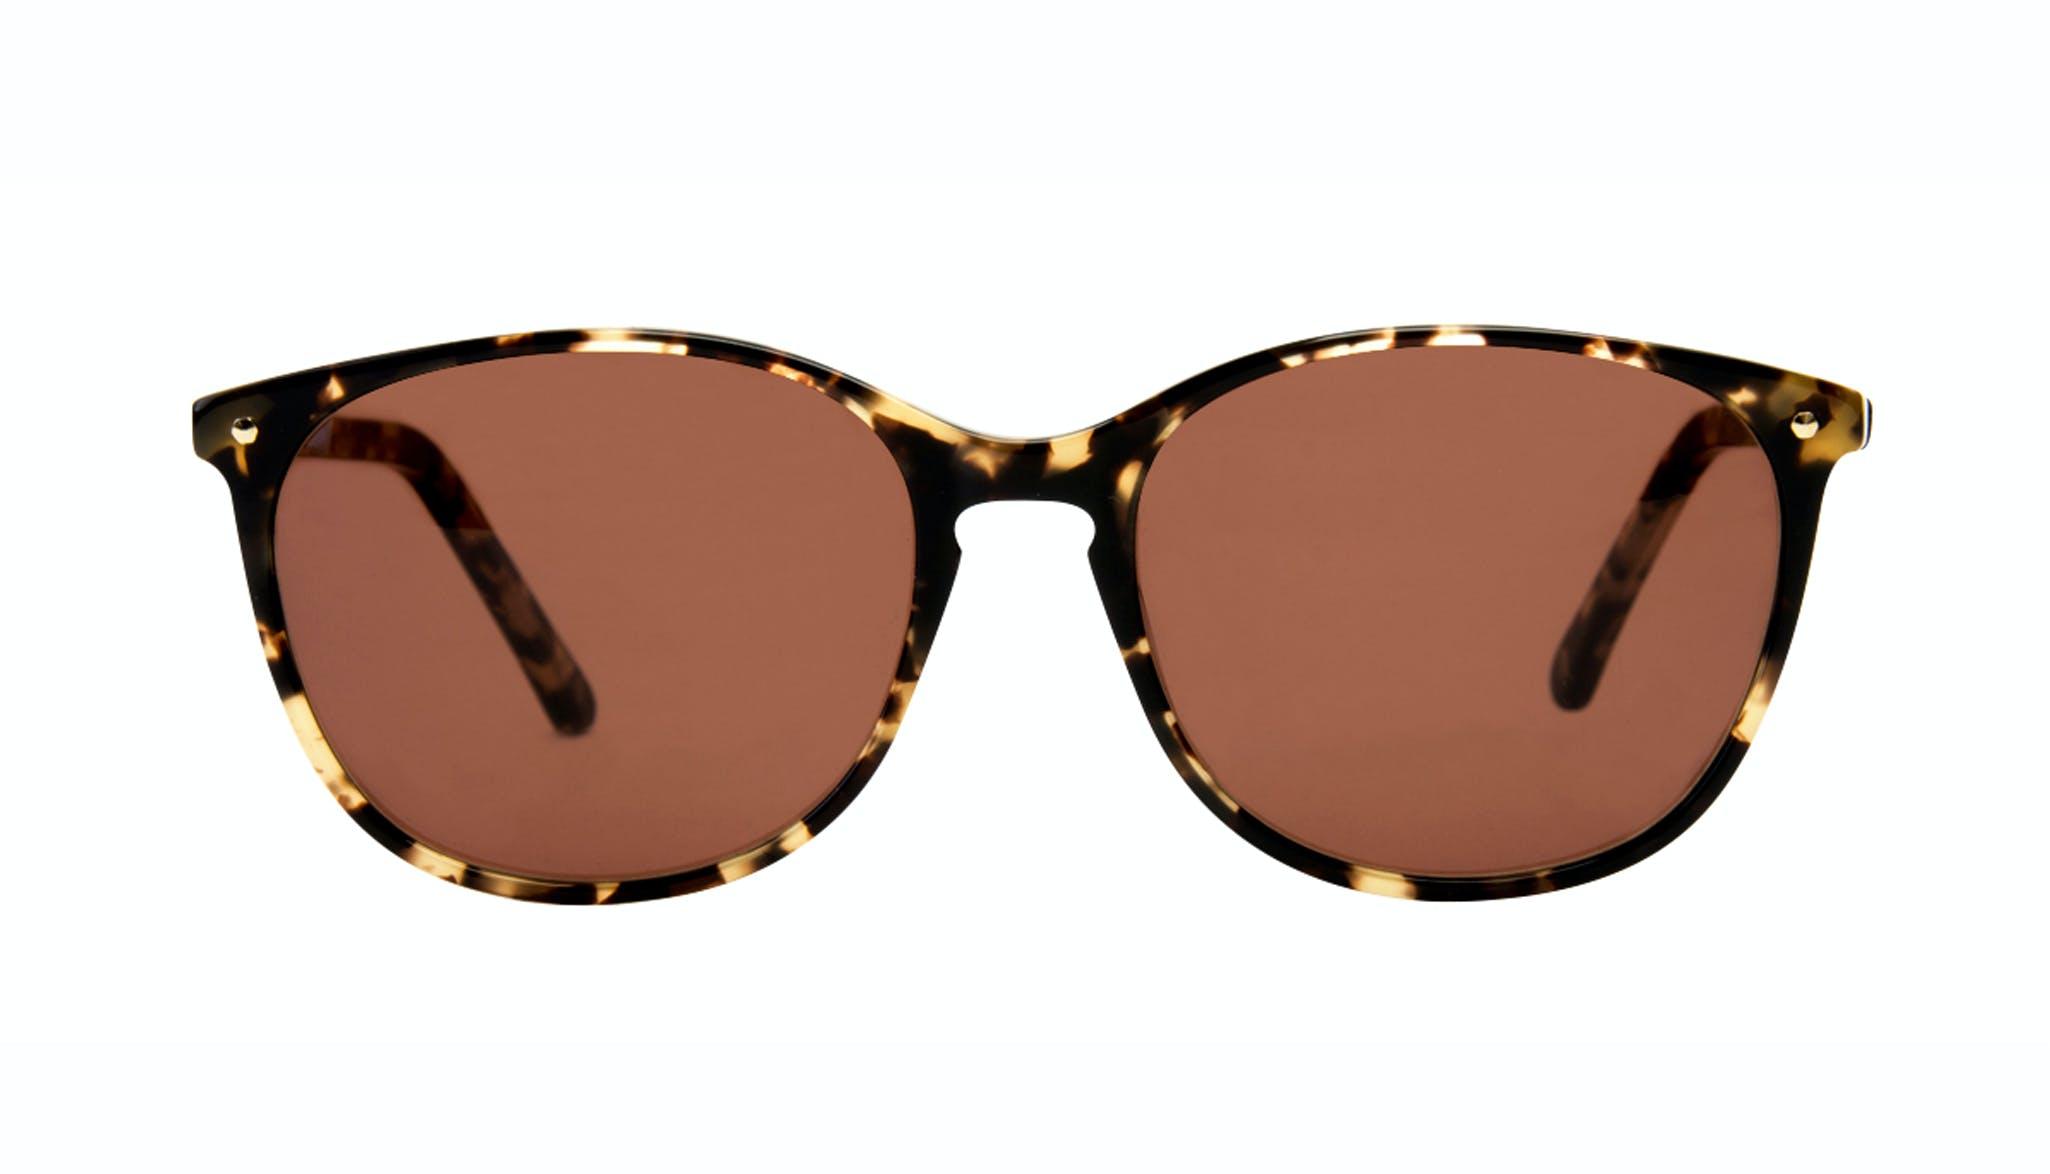 Affordable Fashion Glasses Rectangle Square Round Sunglasses Women Nadine Bingal